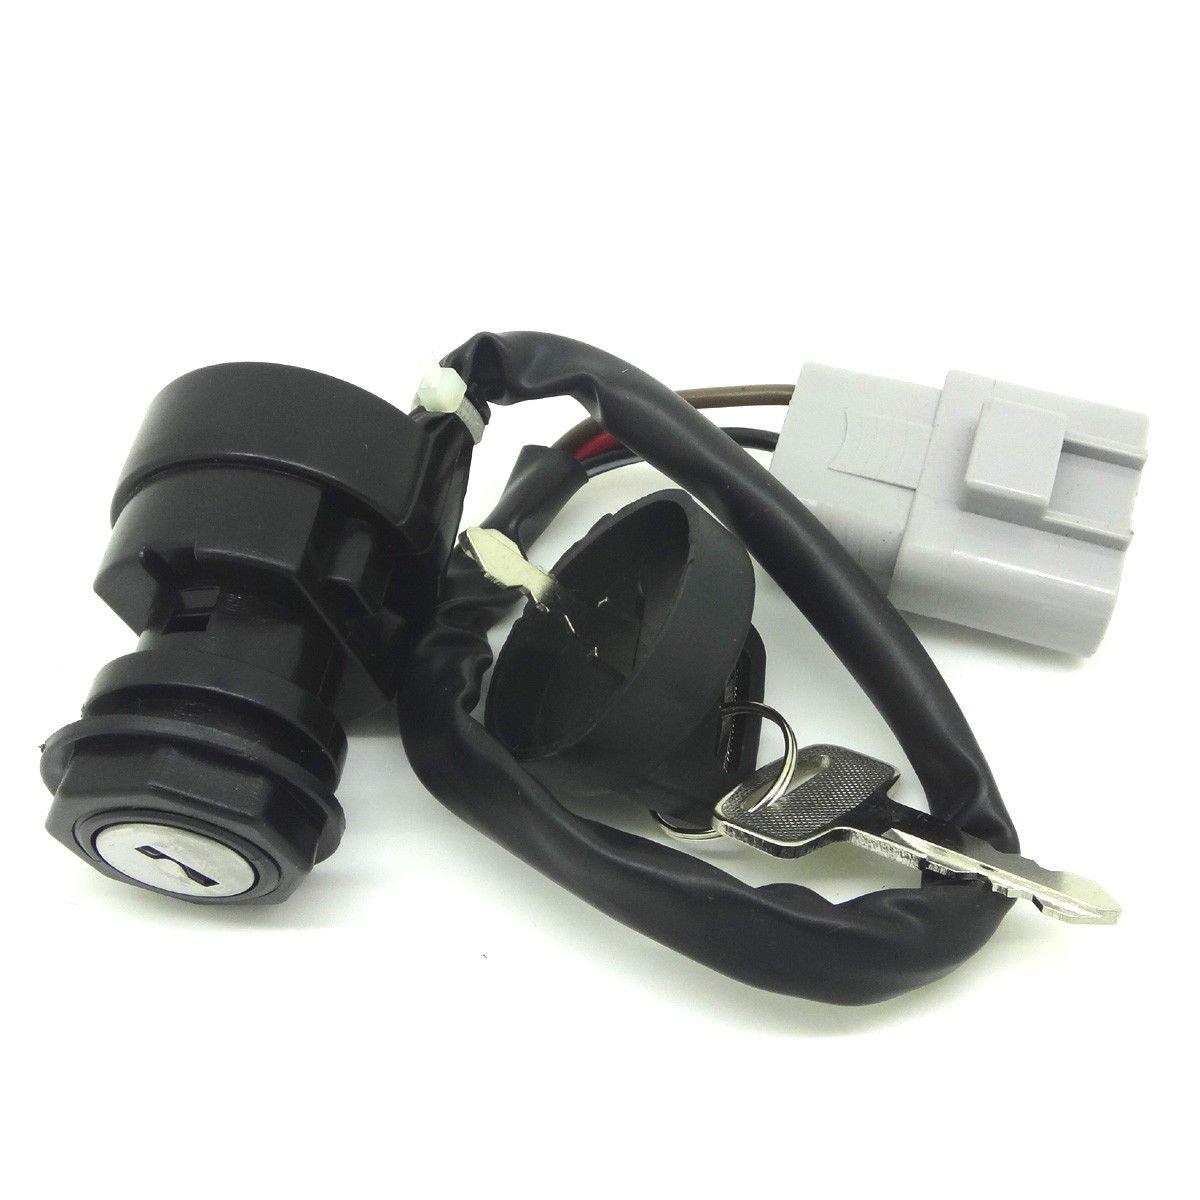 GA 37250-P07-003 New Engine Oil Pressure Switch Fit Honda Civic Accord 1992-2002